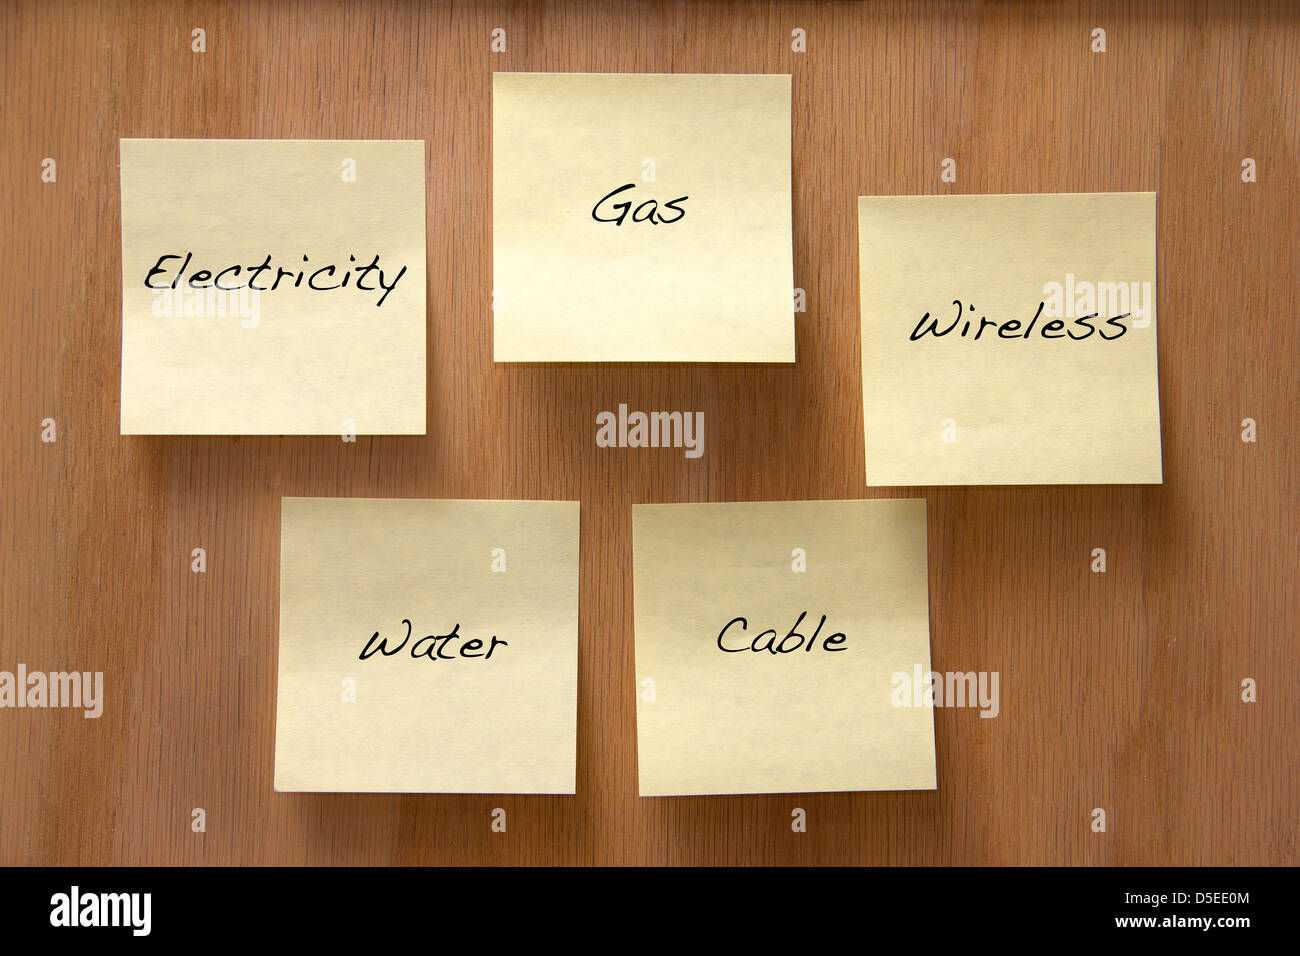 Common home utilities - Stock Image